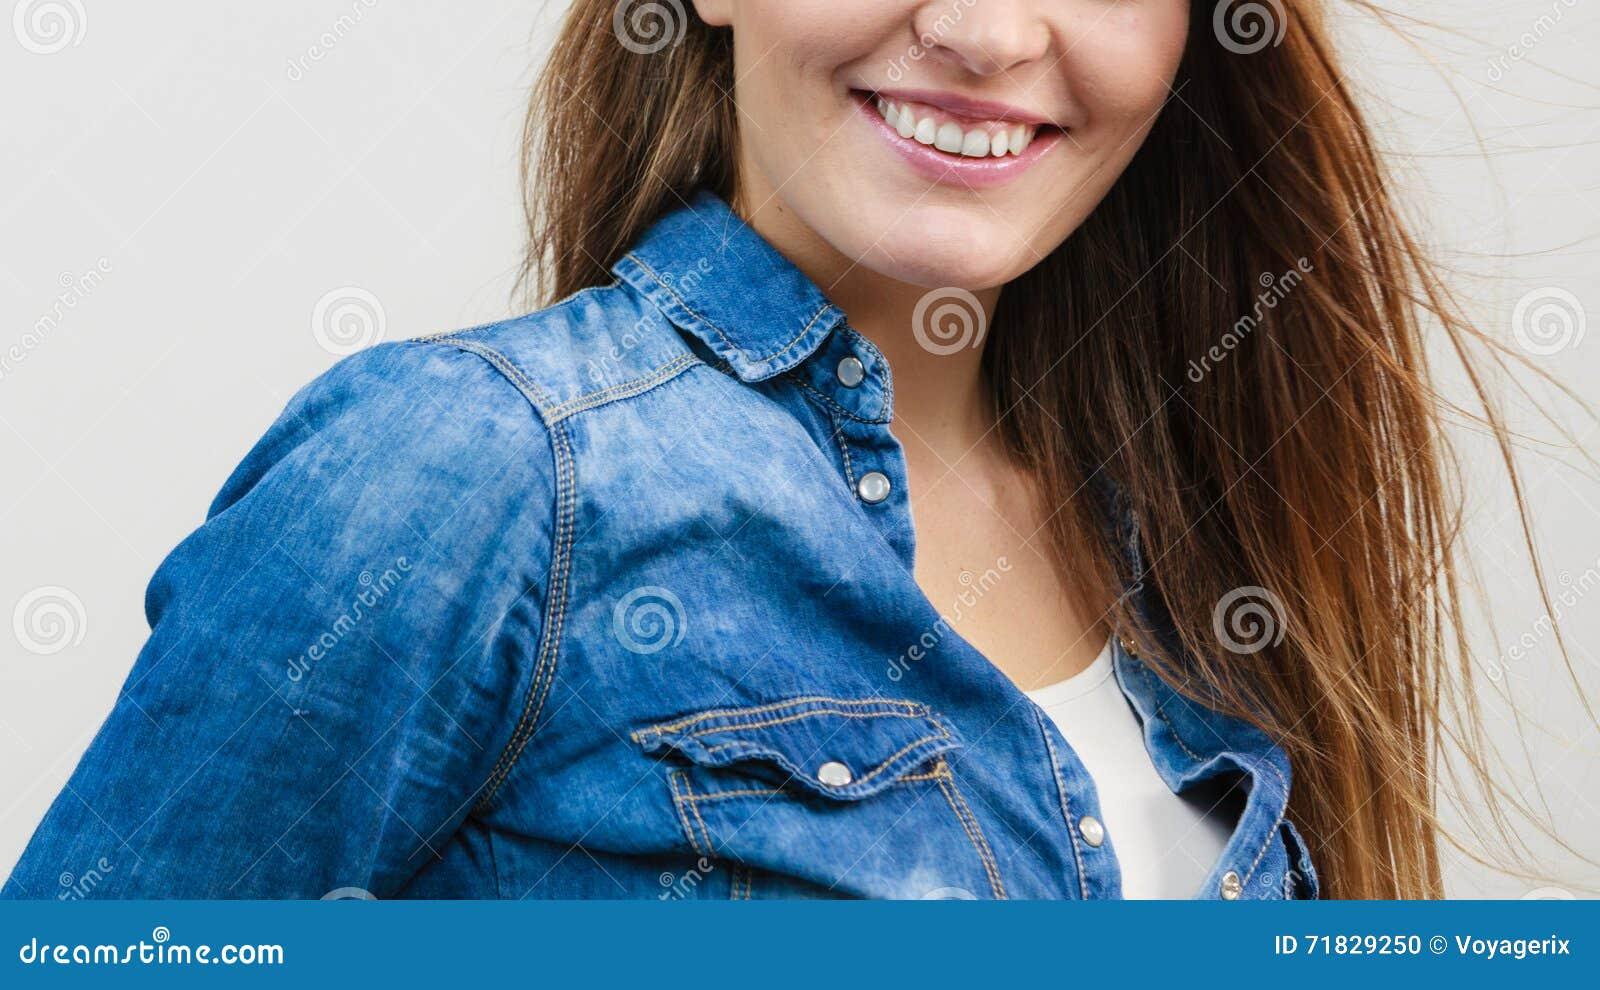 grinning and happy joy kogawa By joy kogawa plot summary:  travels, and was happy to understand that literary elusion  grinning and happy, and all smiles standing around a.